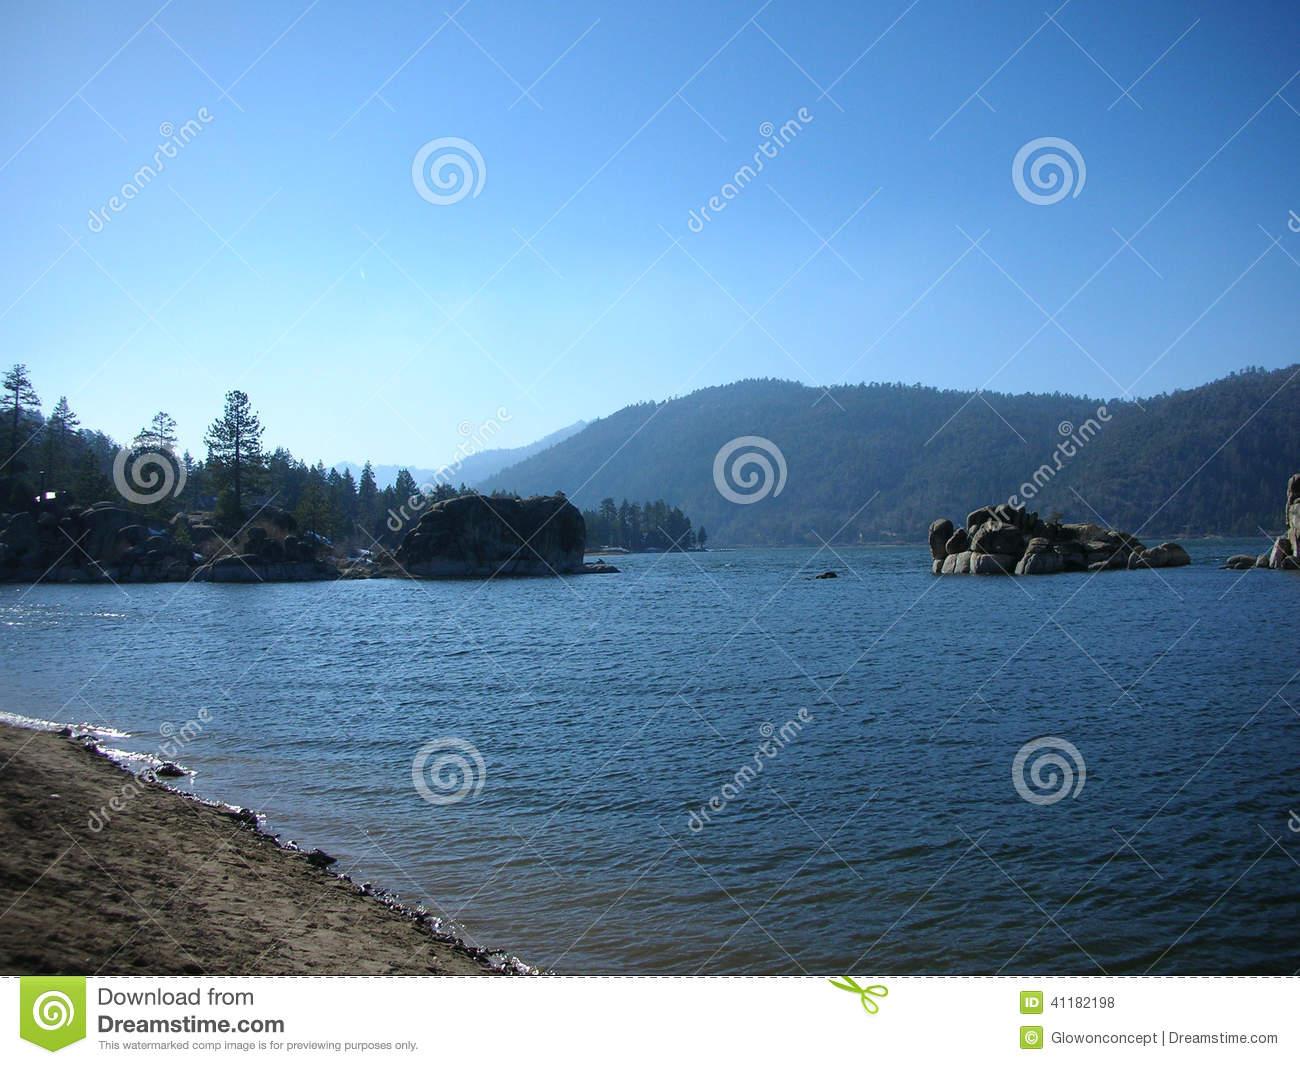 Bear Lakes Basin clipart #16, Download drawings